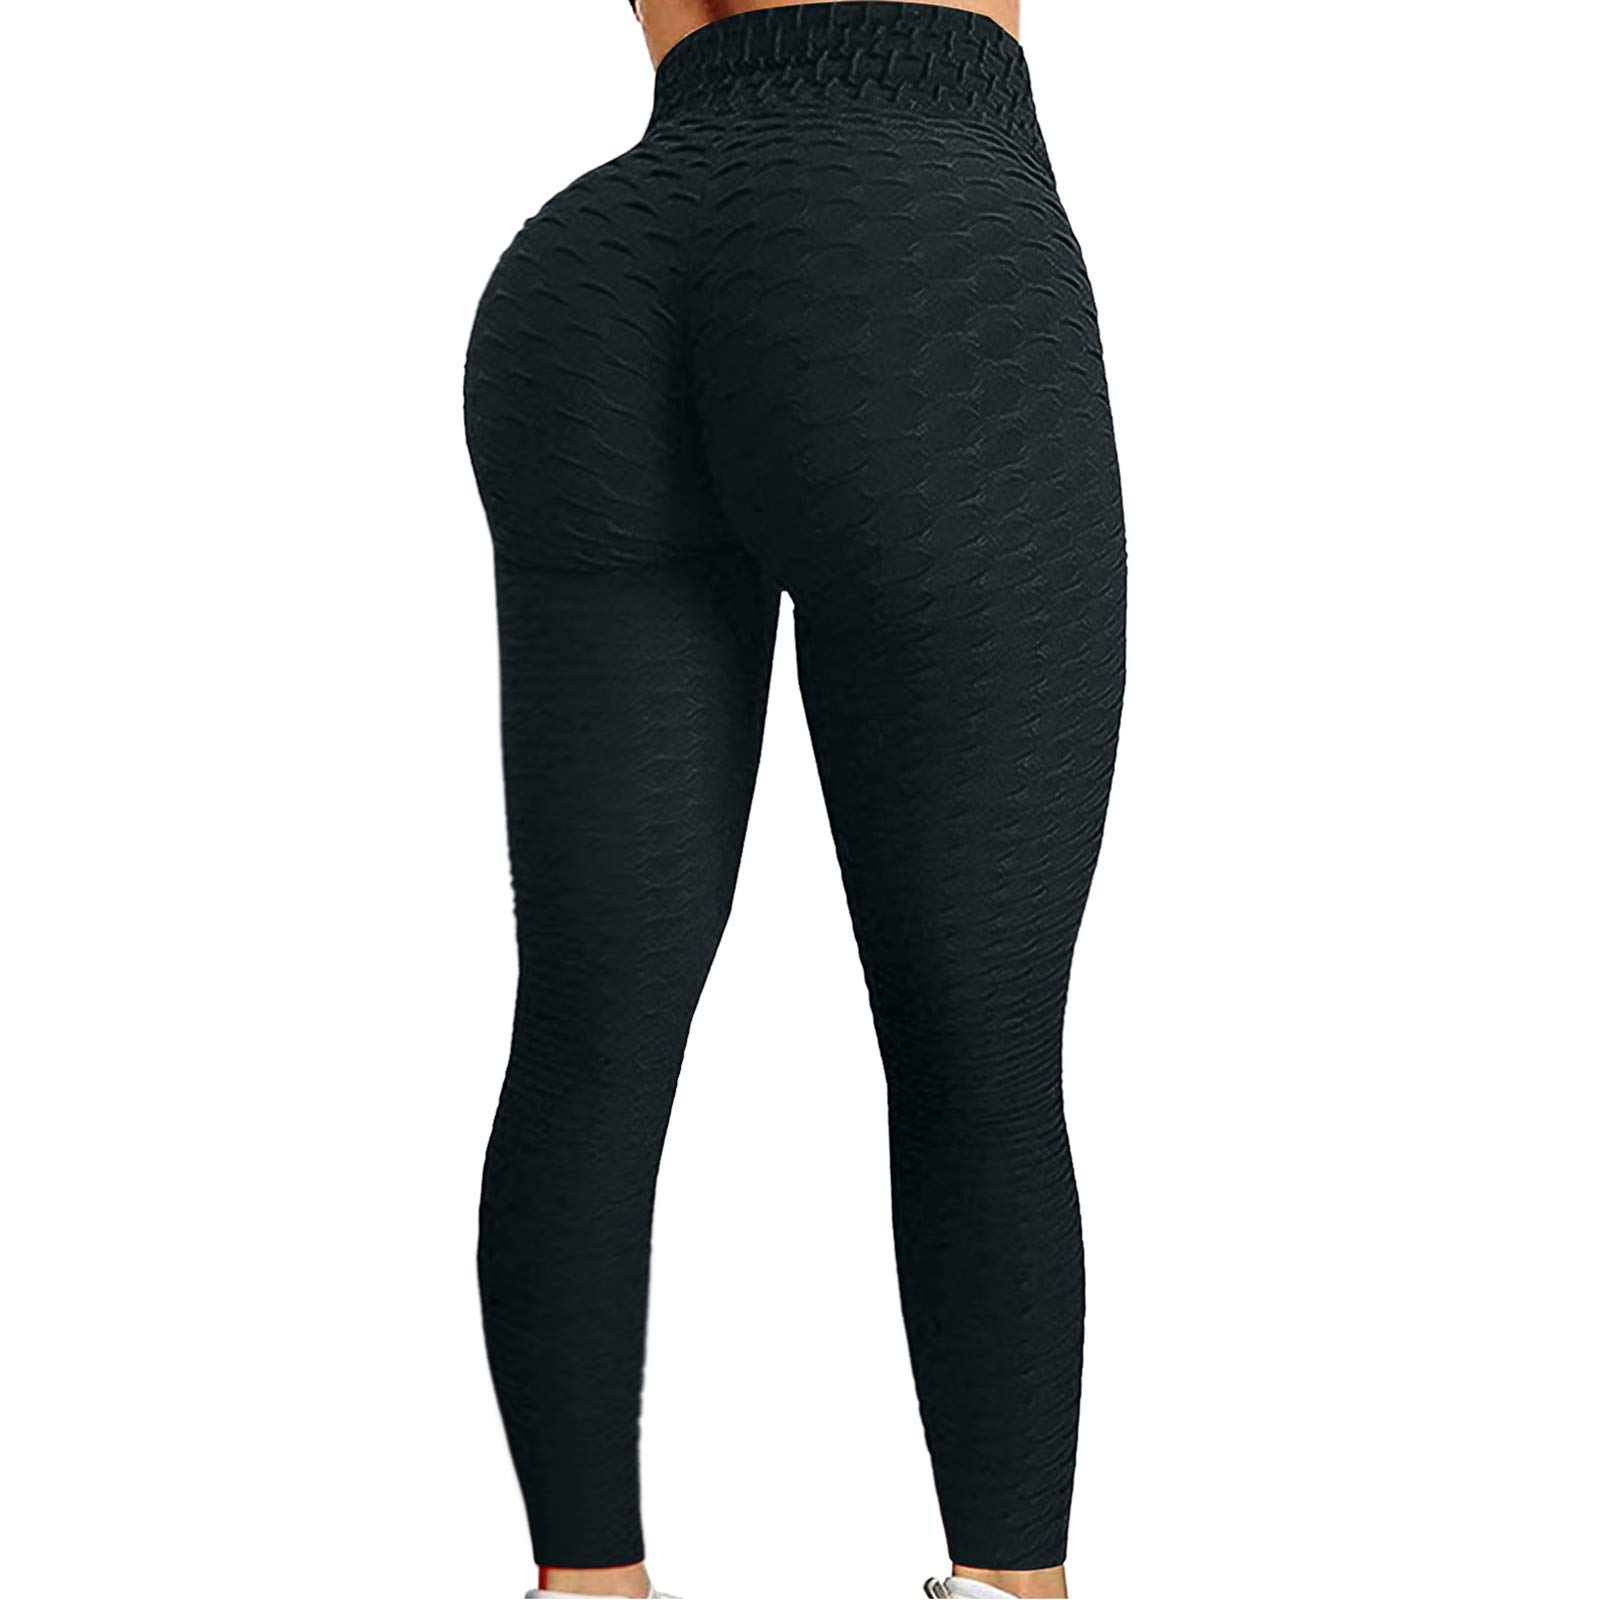 ZEFOTIM Yoga Pants for Women Butt Lifting,Bubble Hip Anti Cellulite Legging High Waist Tummy Control Yoga Tights